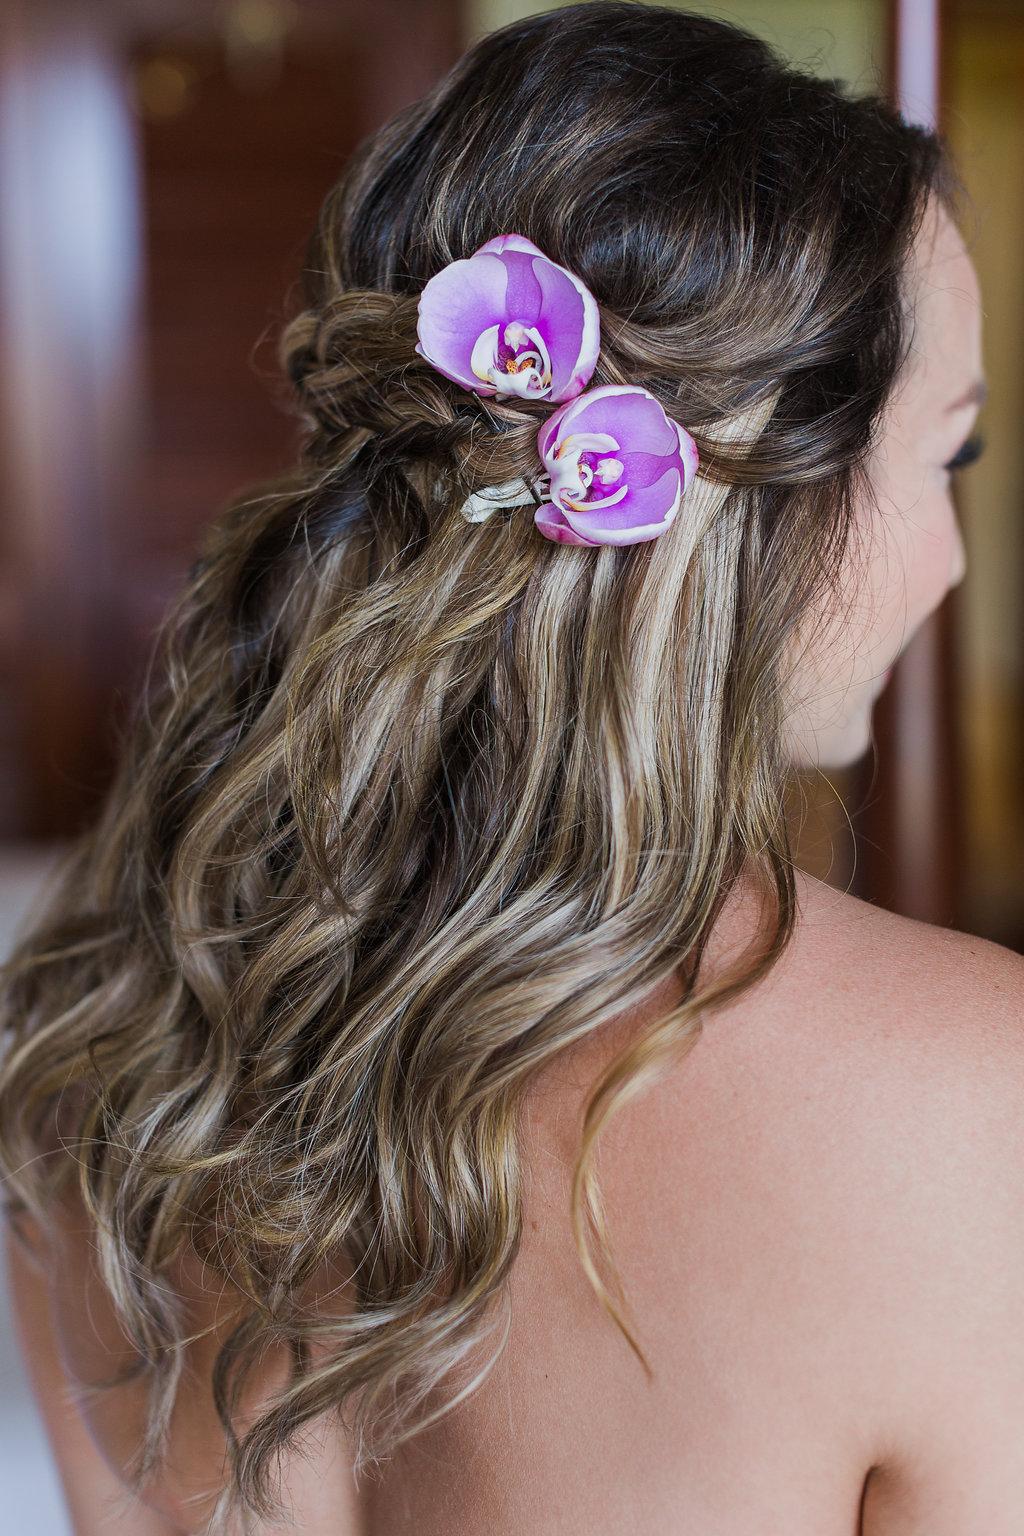 kauai-wedding-flowers-hair.jpg